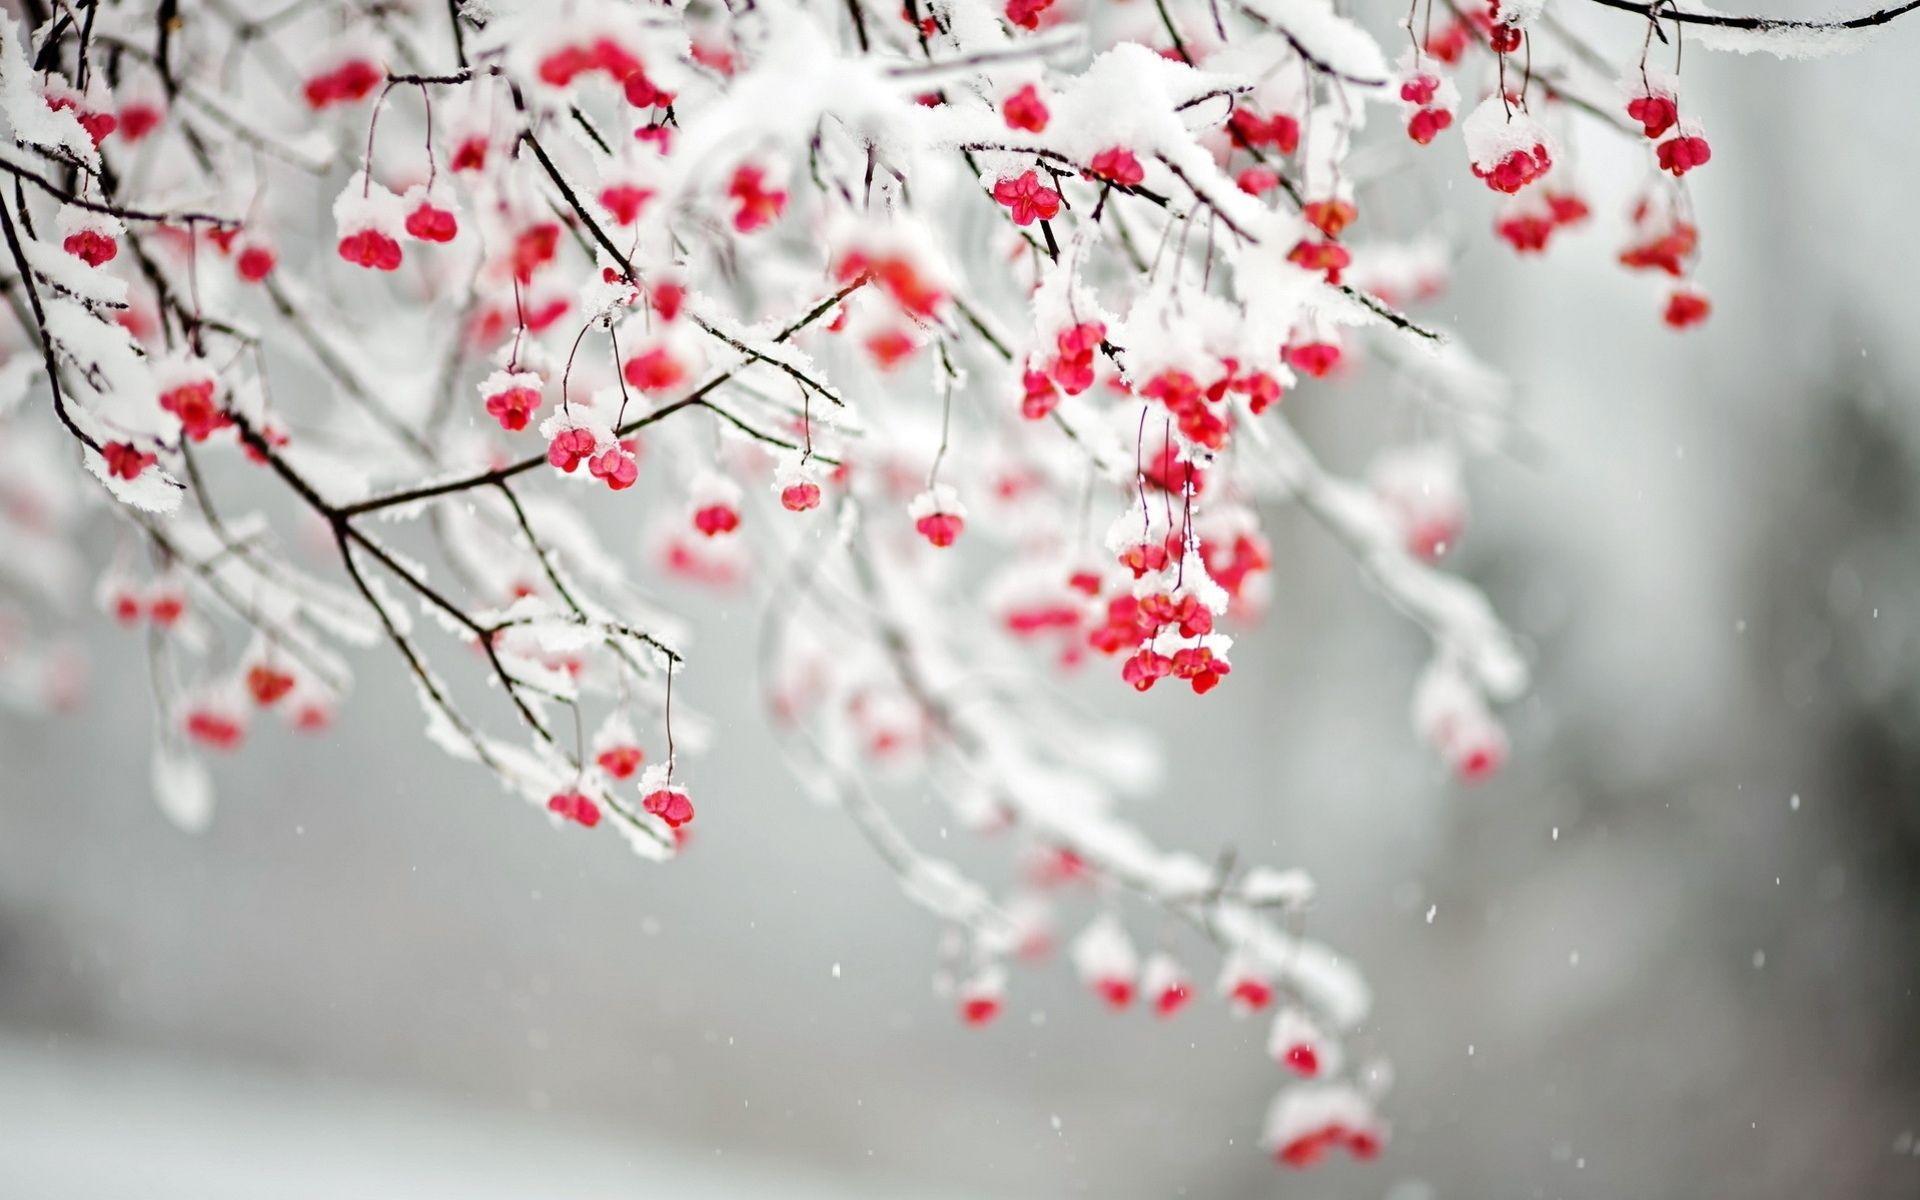 winter flowers wallpapers - wallpaper cave